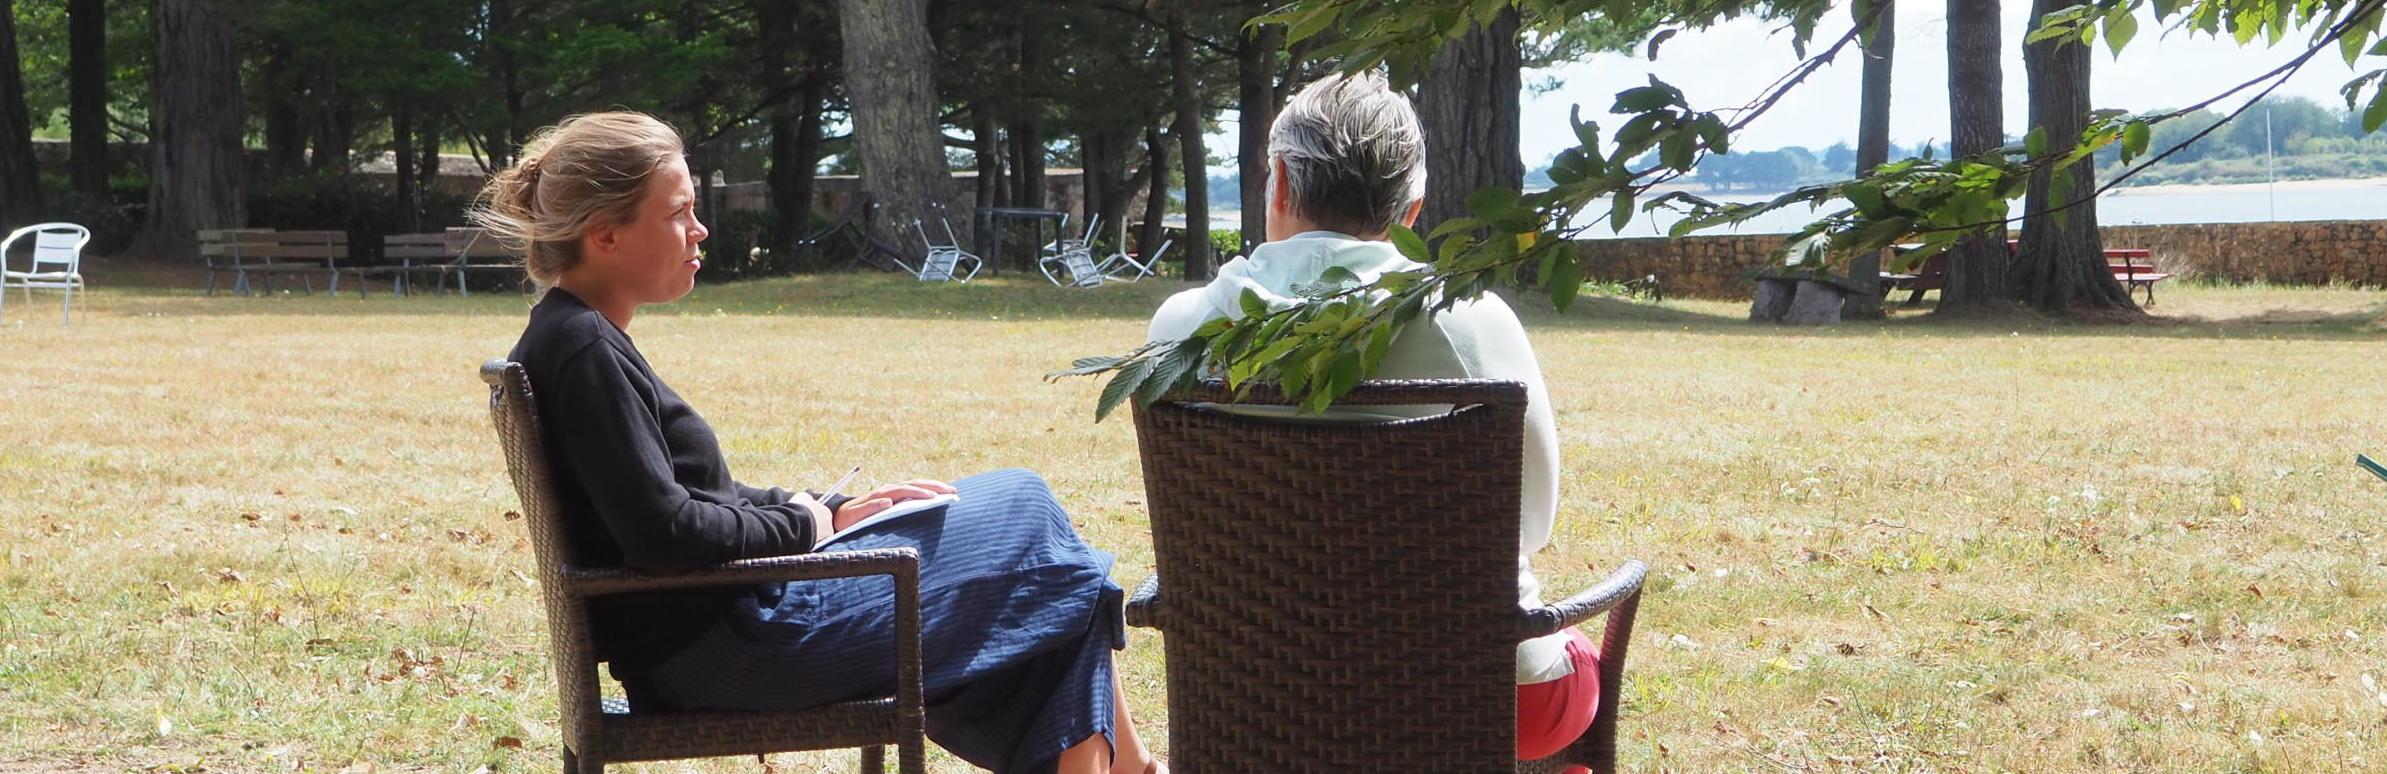 Accompagnement spirituel et retraite